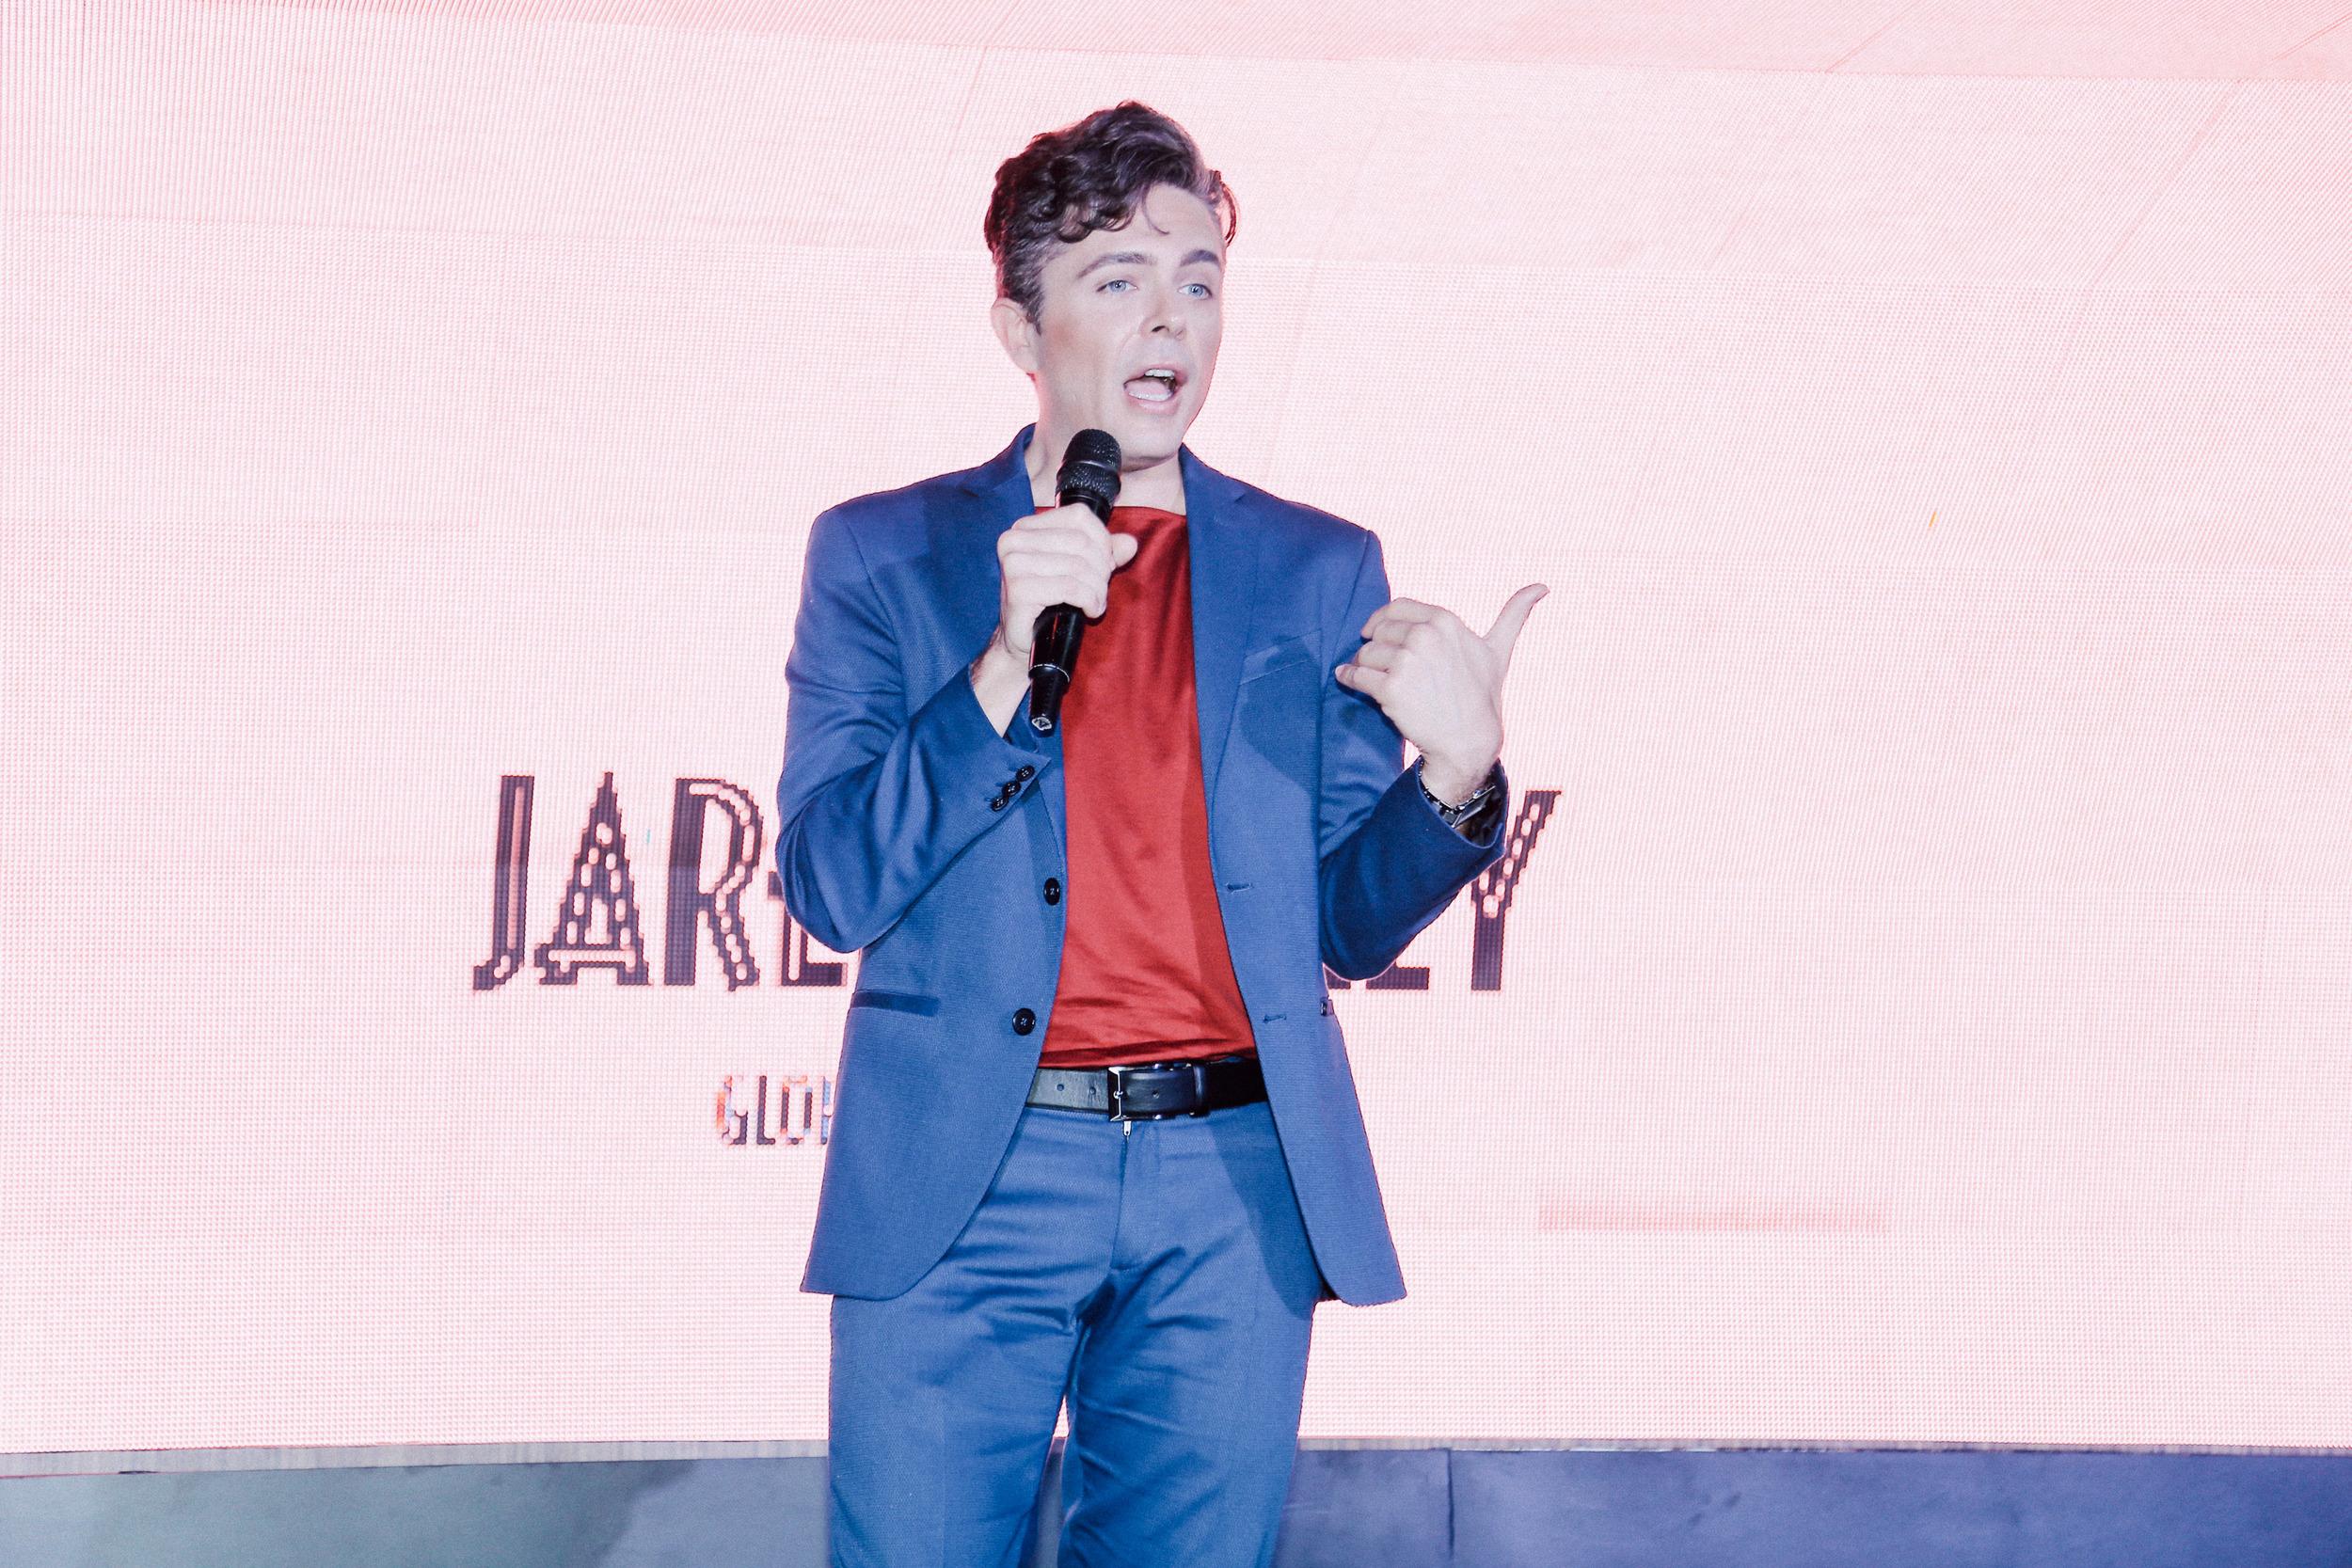 Benefit global brow expert Jared Bailey